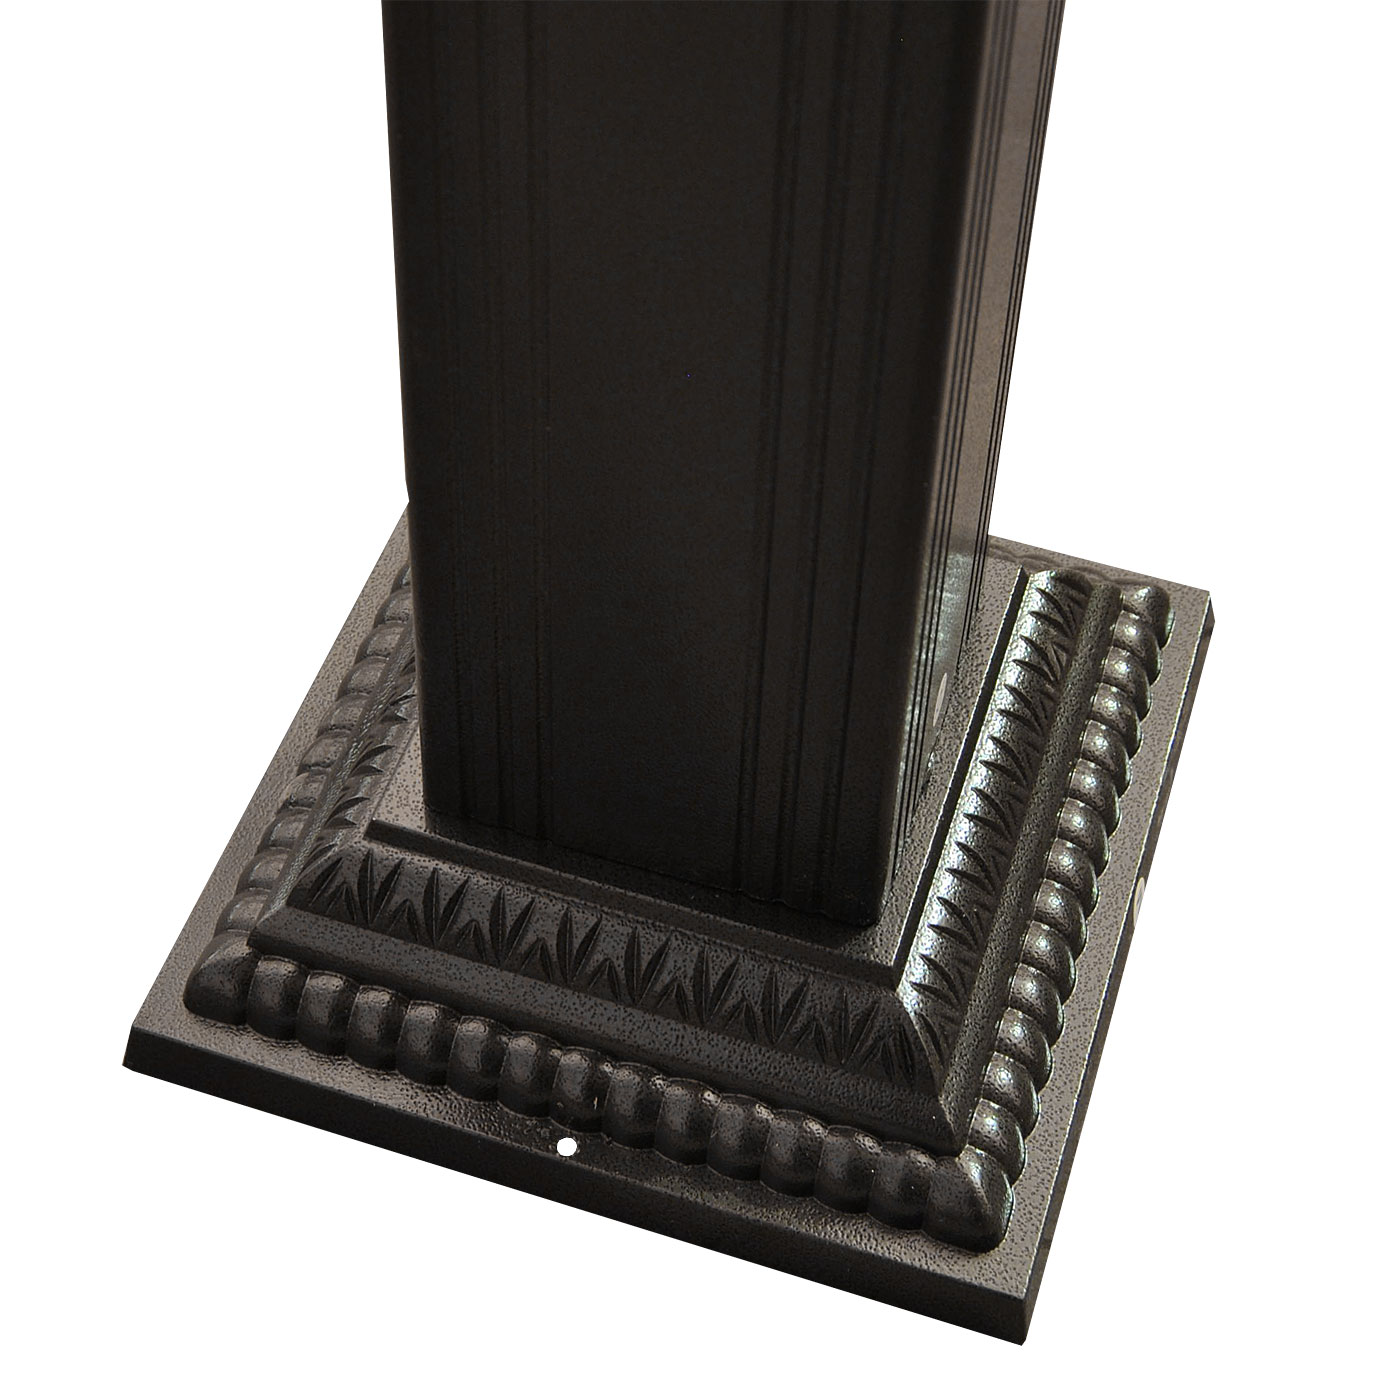 pergola mira garten pavillon 12cm luxus alu gestell 3 5x3 5m oder 4 5x3 5m ebay. Black Bedroom Furniture Sets. Home Design Ideas